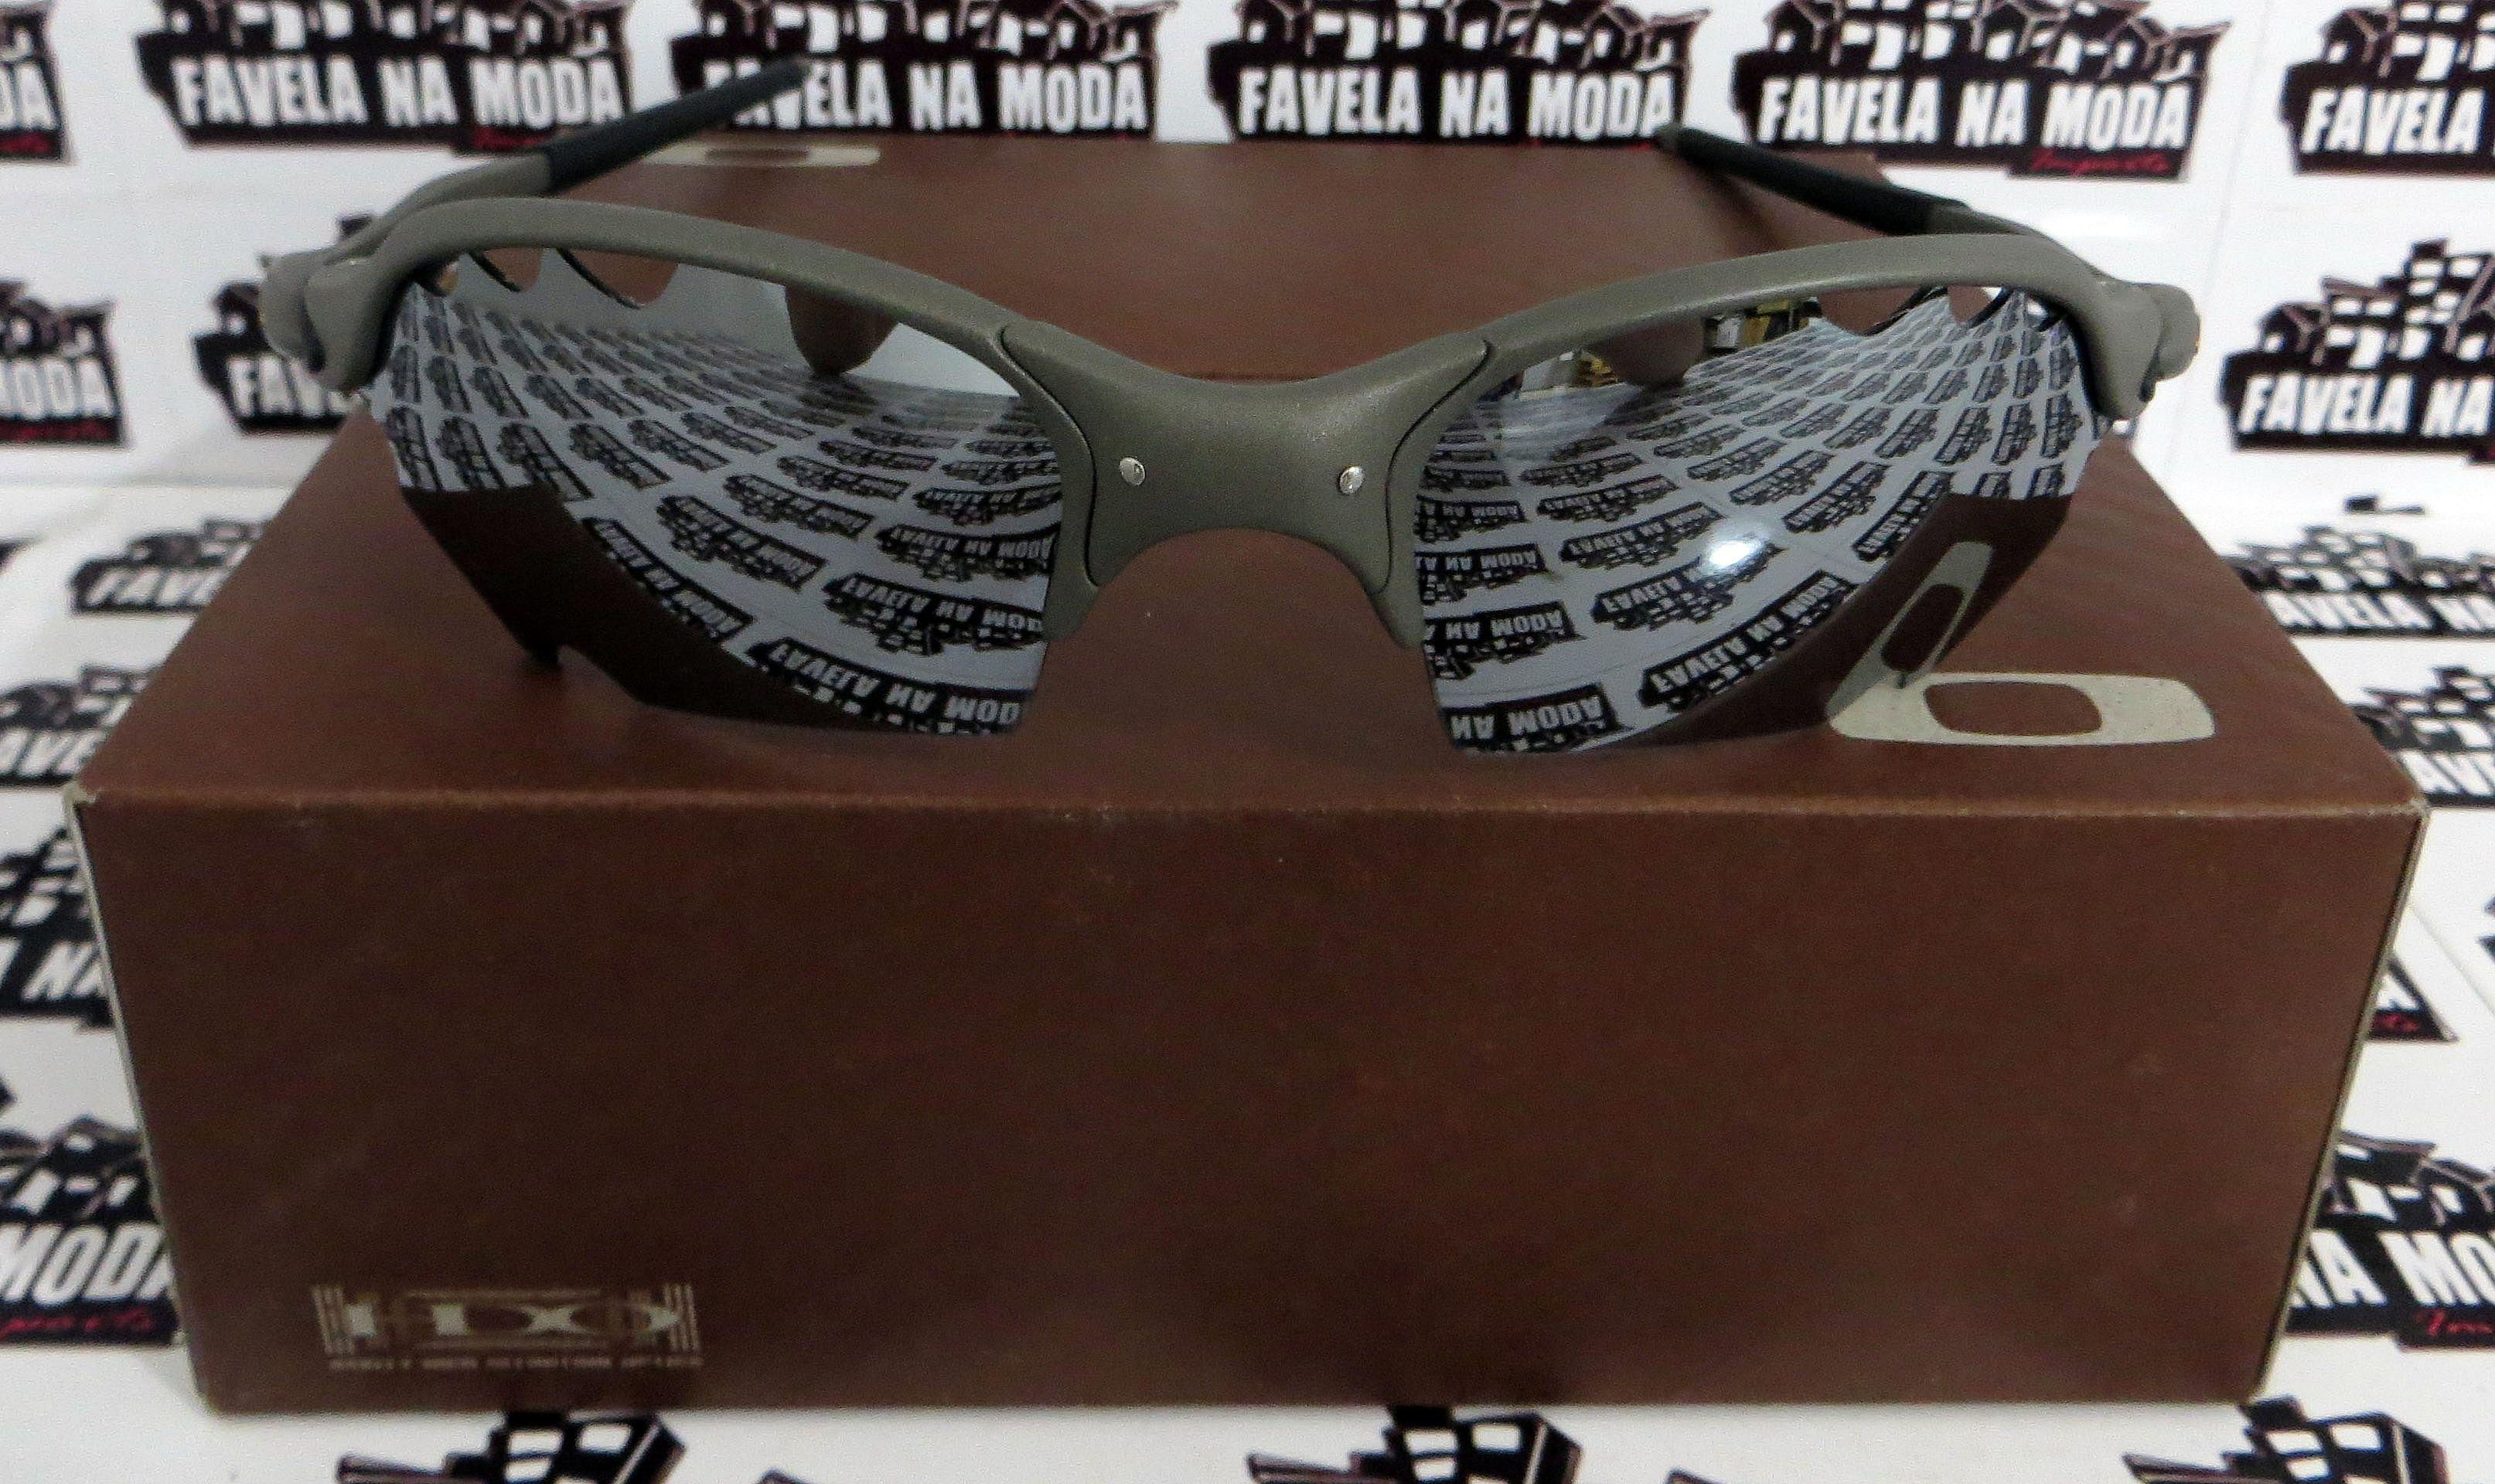 501c18481b4a2 Óculos - Óculos Oakley - Romeo 2 - Favela na Moda Imports